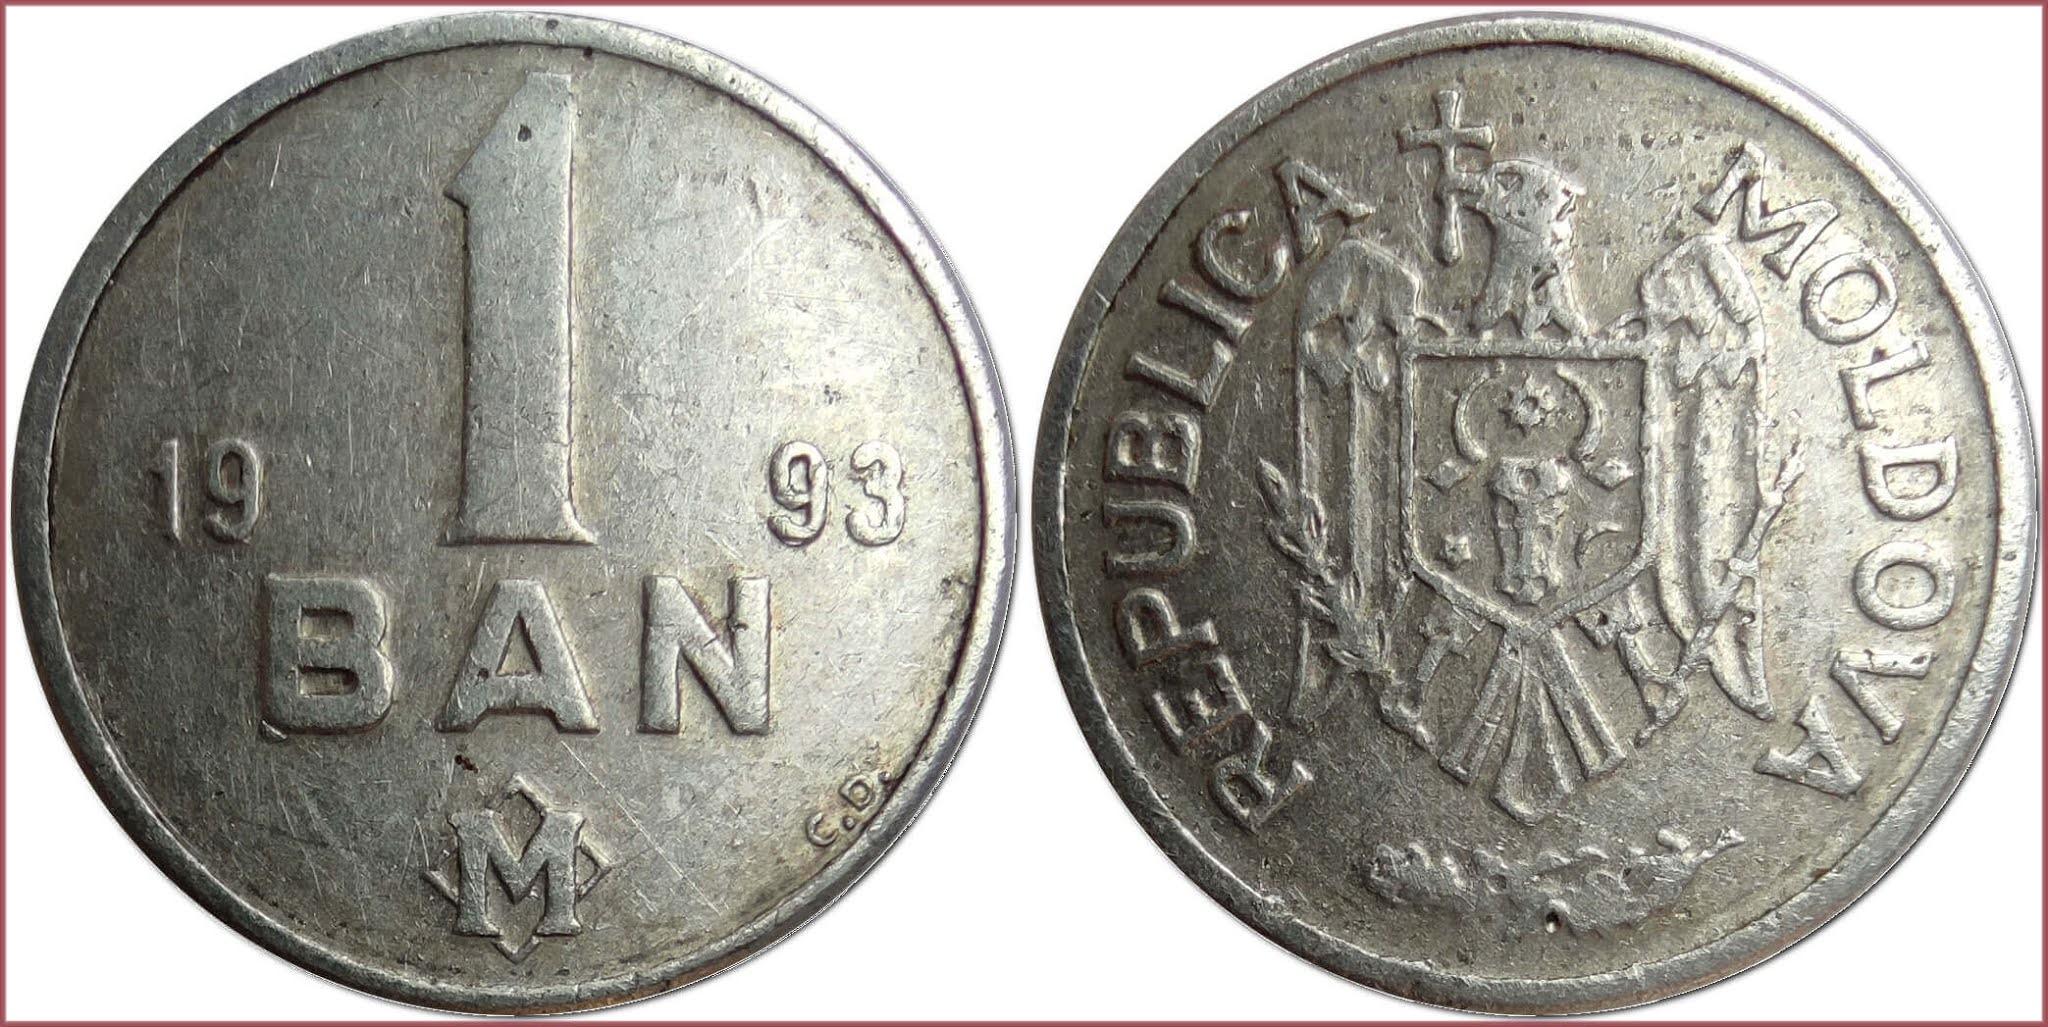 1 ban, 1993: Republic of Moldova